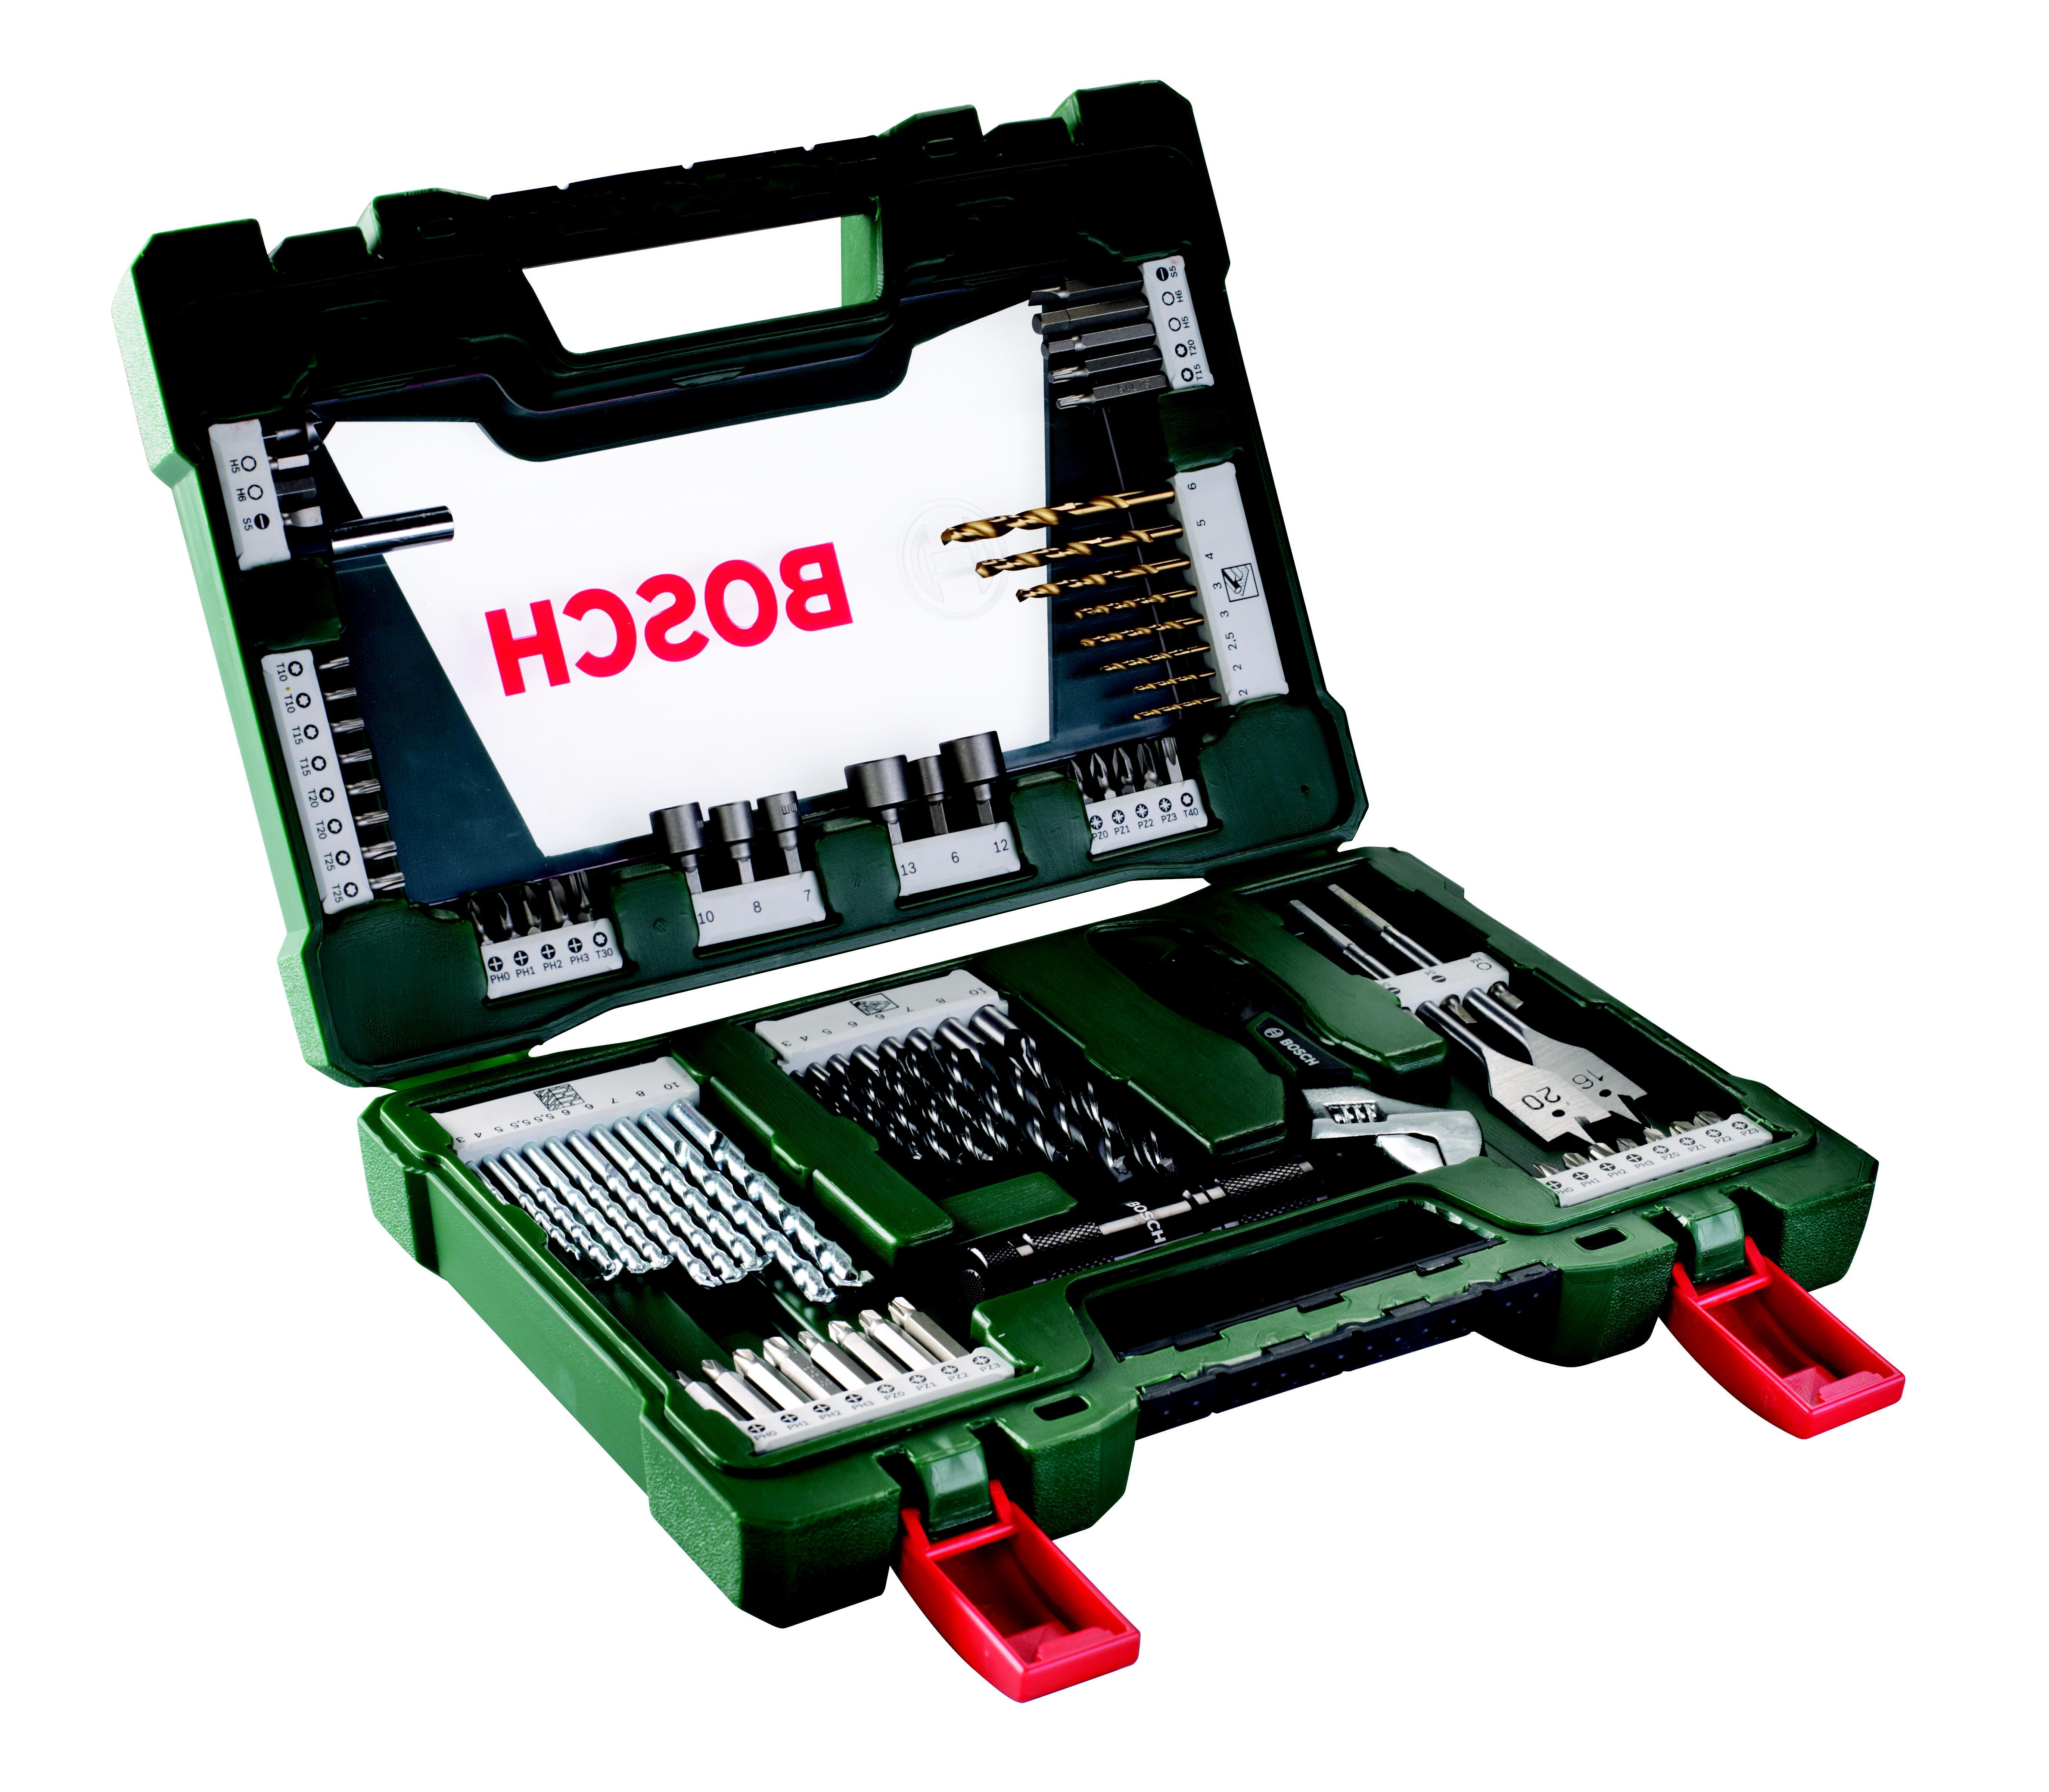 Набор бит и сверл Bosch V-line-83 83шт (2.607.017.193) набор бит и сверел bosch x line 70 2607019329879